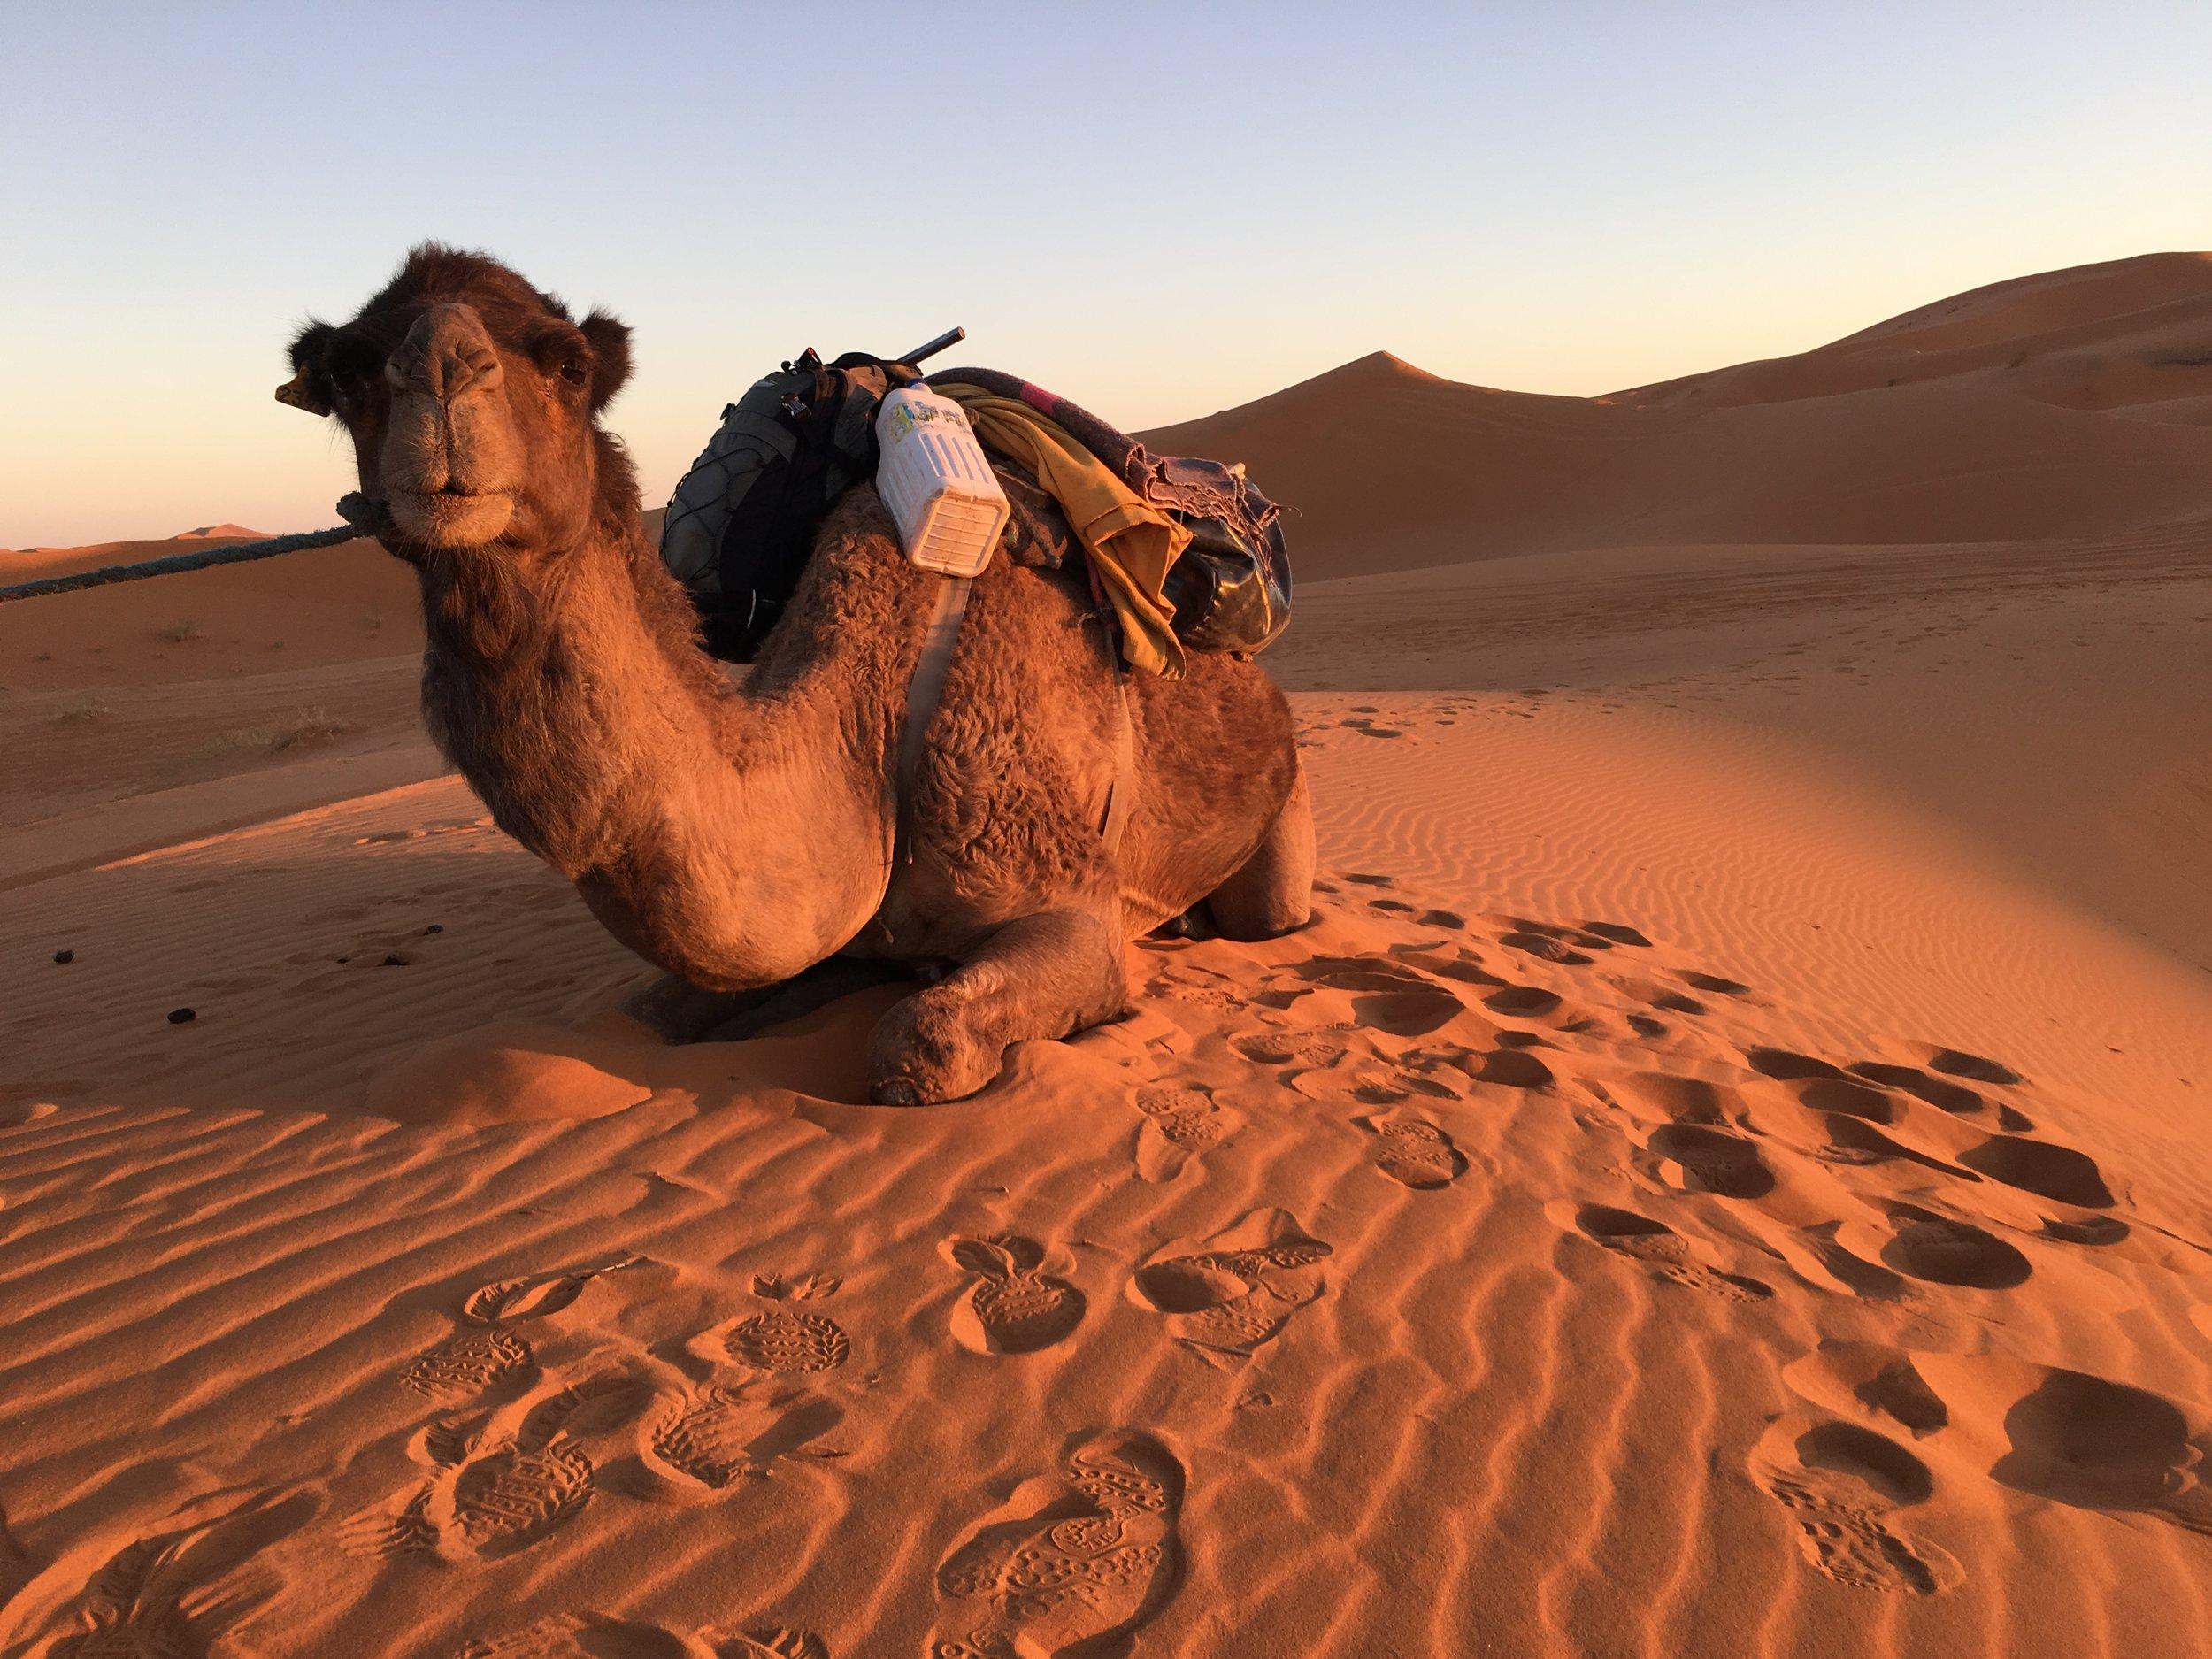 Sahara - Poster Camel.JPG